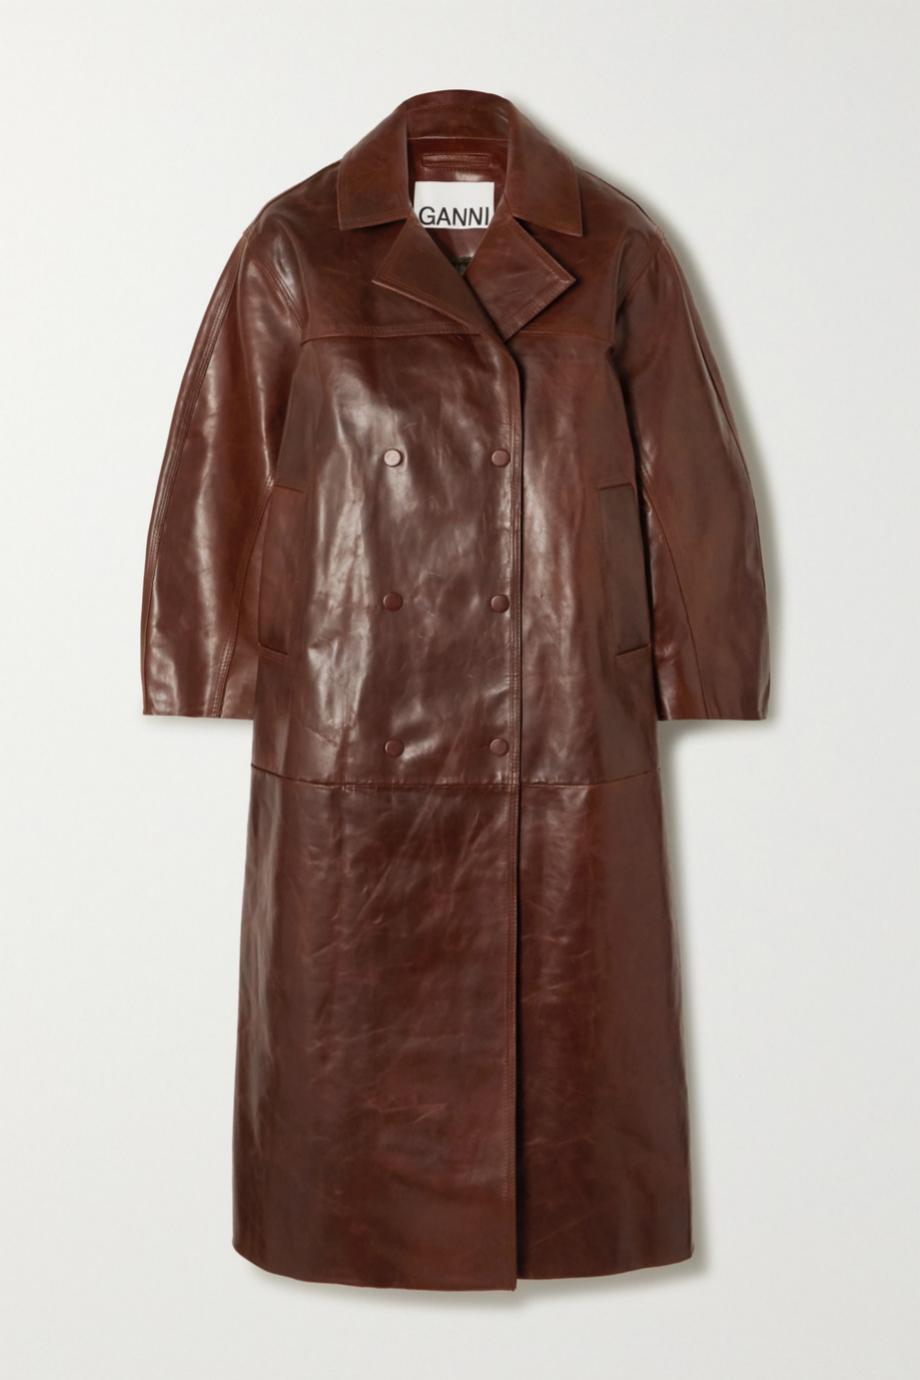 Abrigo de piel de estilo vintage de Ganni para Net a porter